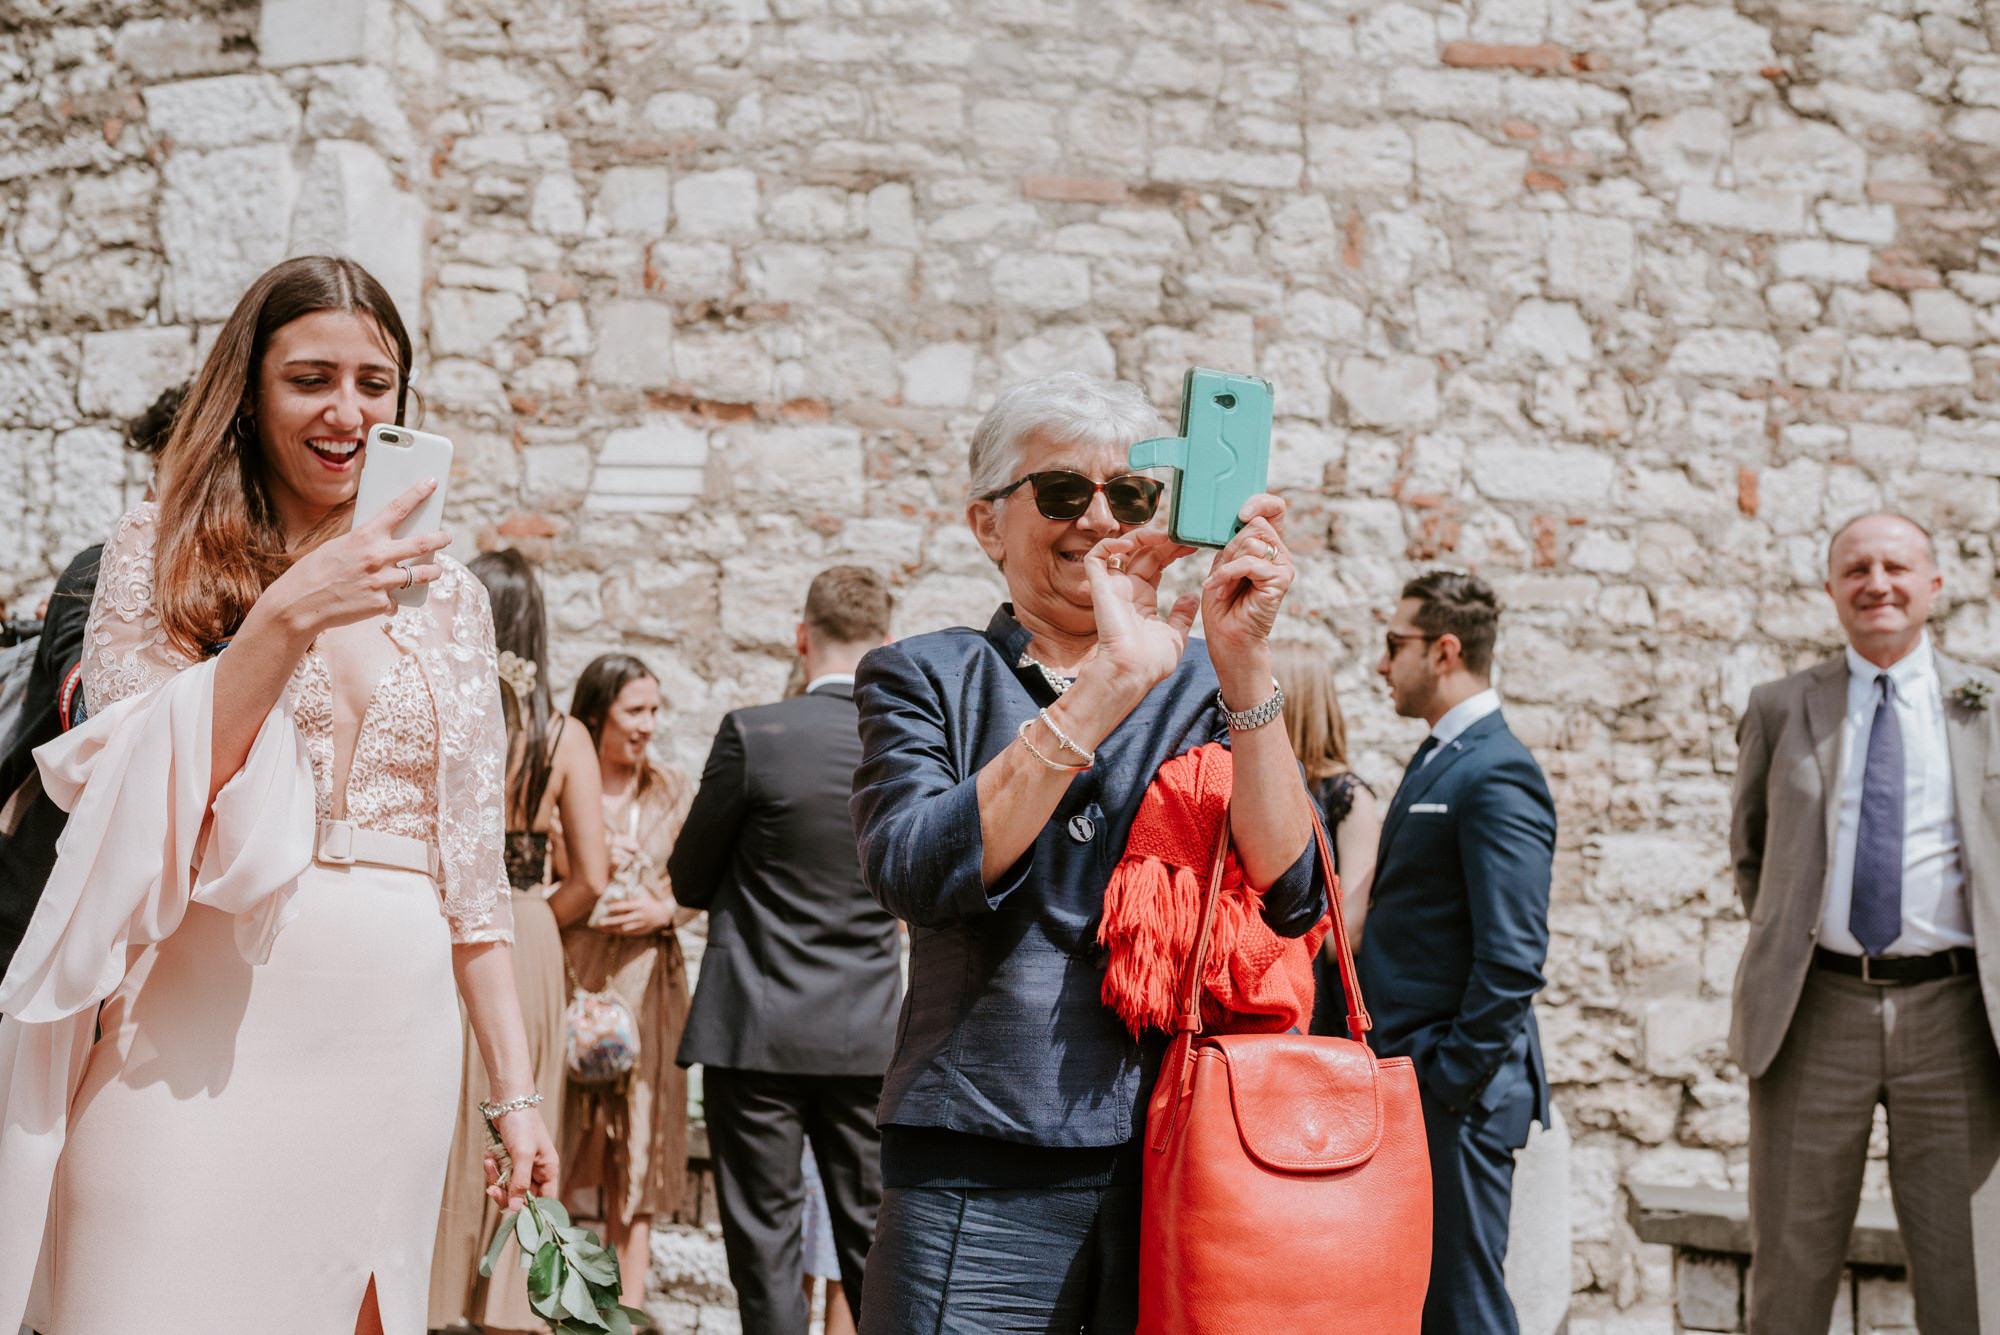 FOTO+PHOTO+BODA+WEDDING+ITALIA+ITALY+MAURICIO+GARAY+MAURICIOGARAY+WEDDINPHOTOGRAPHER+FOTOGRAFODEBODA-605.jpg